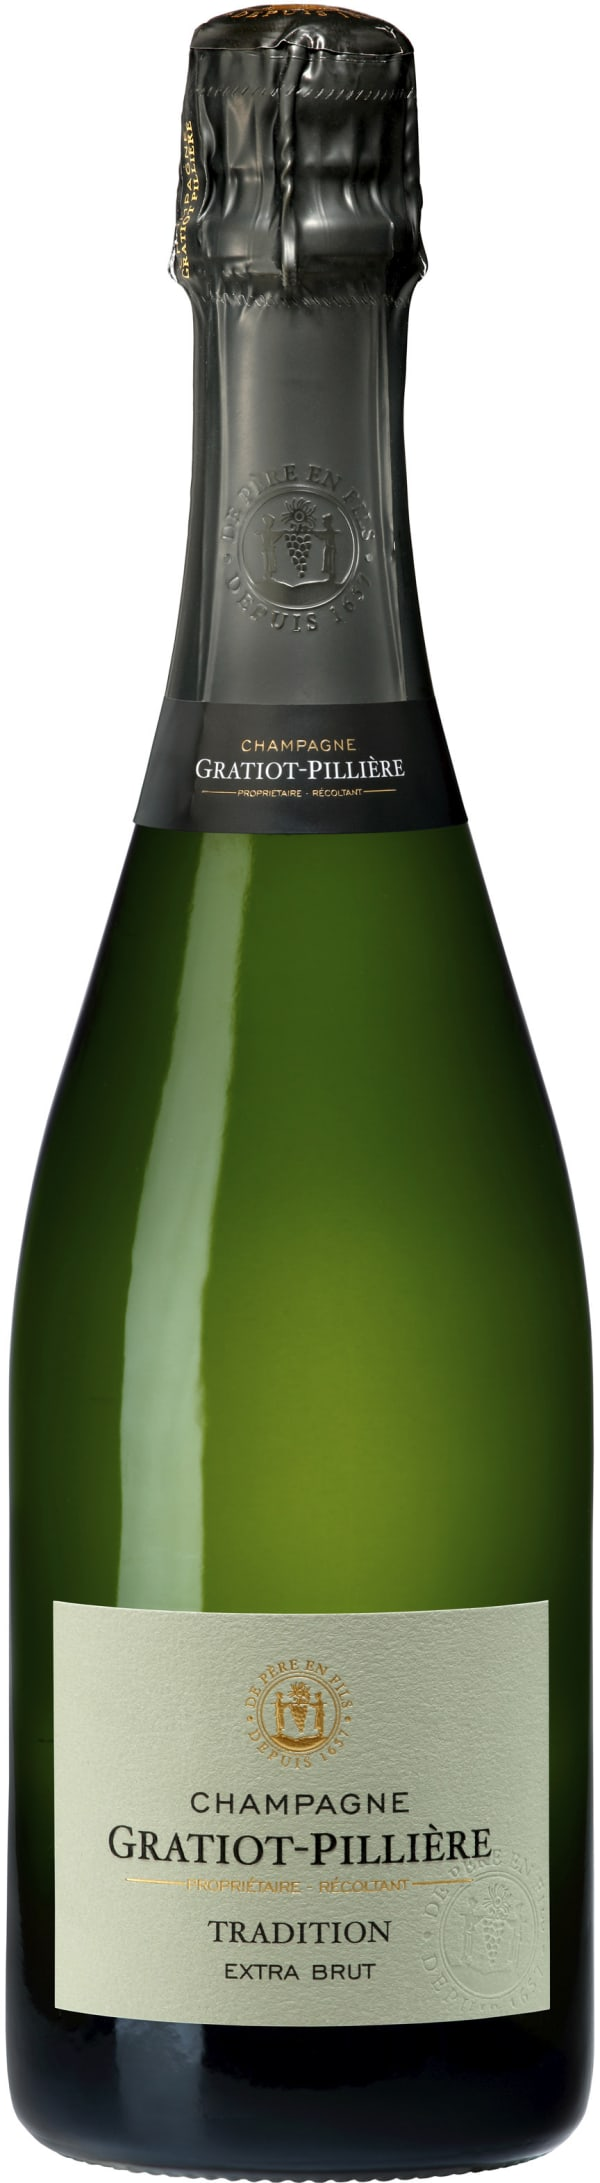 Gratiot Pilliére Tradition Champagne Extra Brut